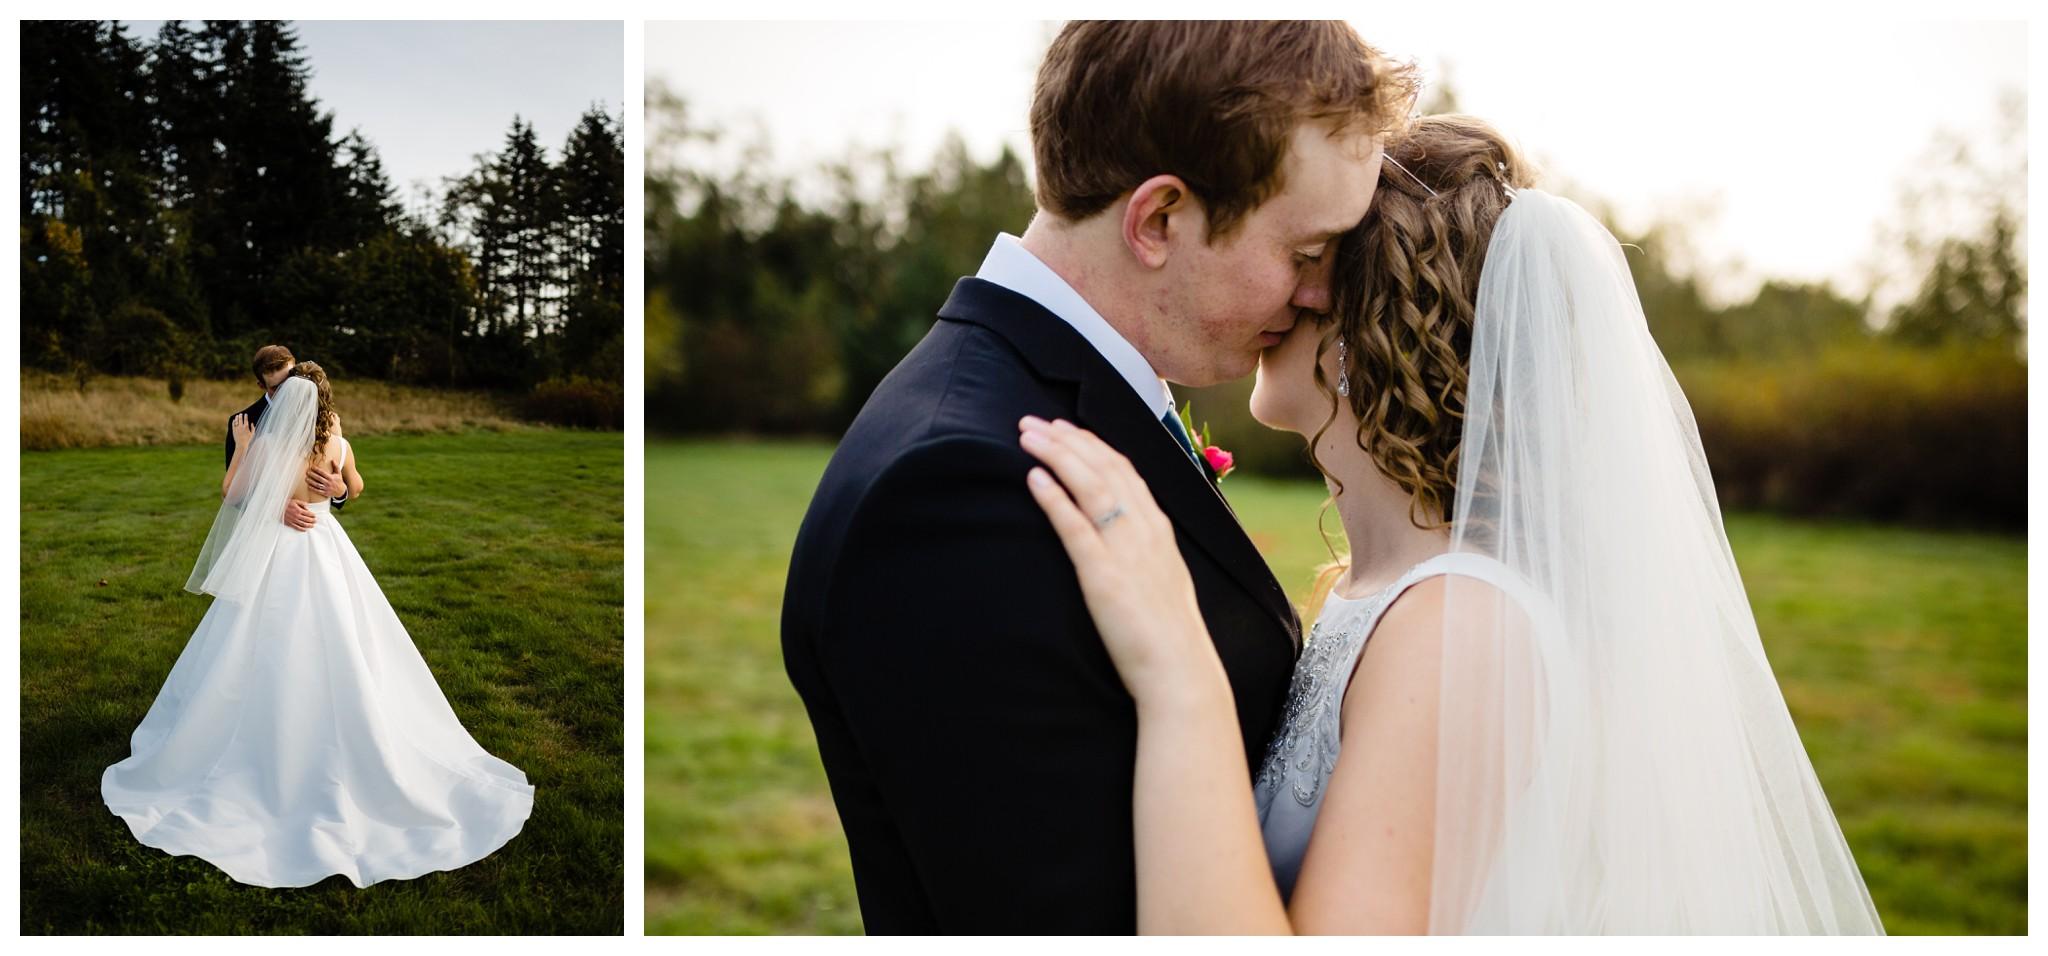 Aldergrove Park Christian Church Wedding Photography Pink Flowers Blue Bridesmaid Dress Fall_0117.jpg